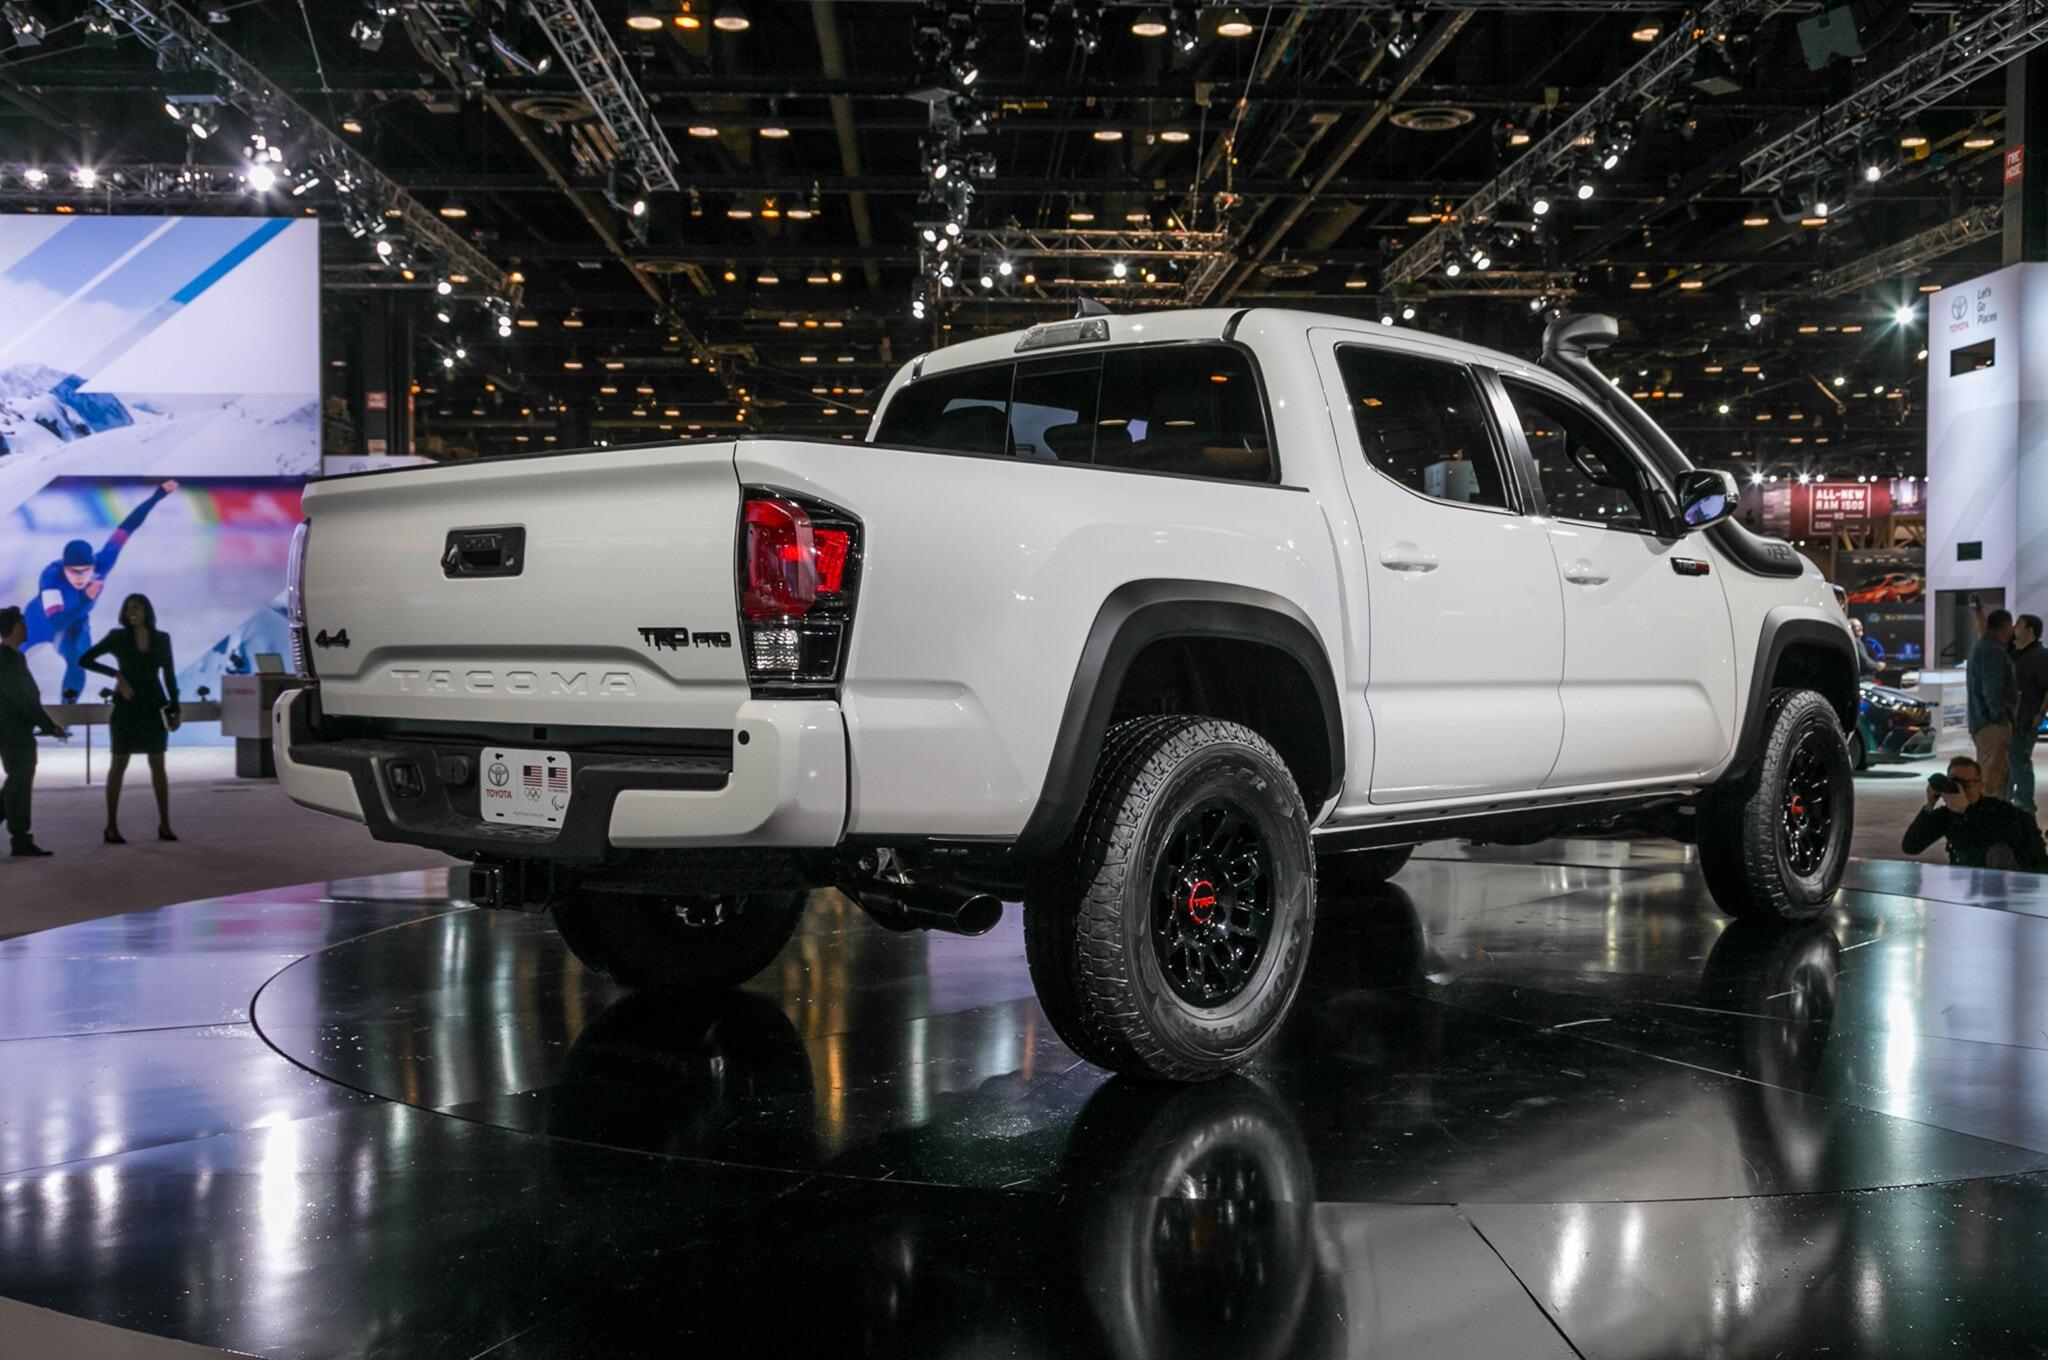 2019-Toyota-Tacoma-TRD-Pro-rear-three-quarter